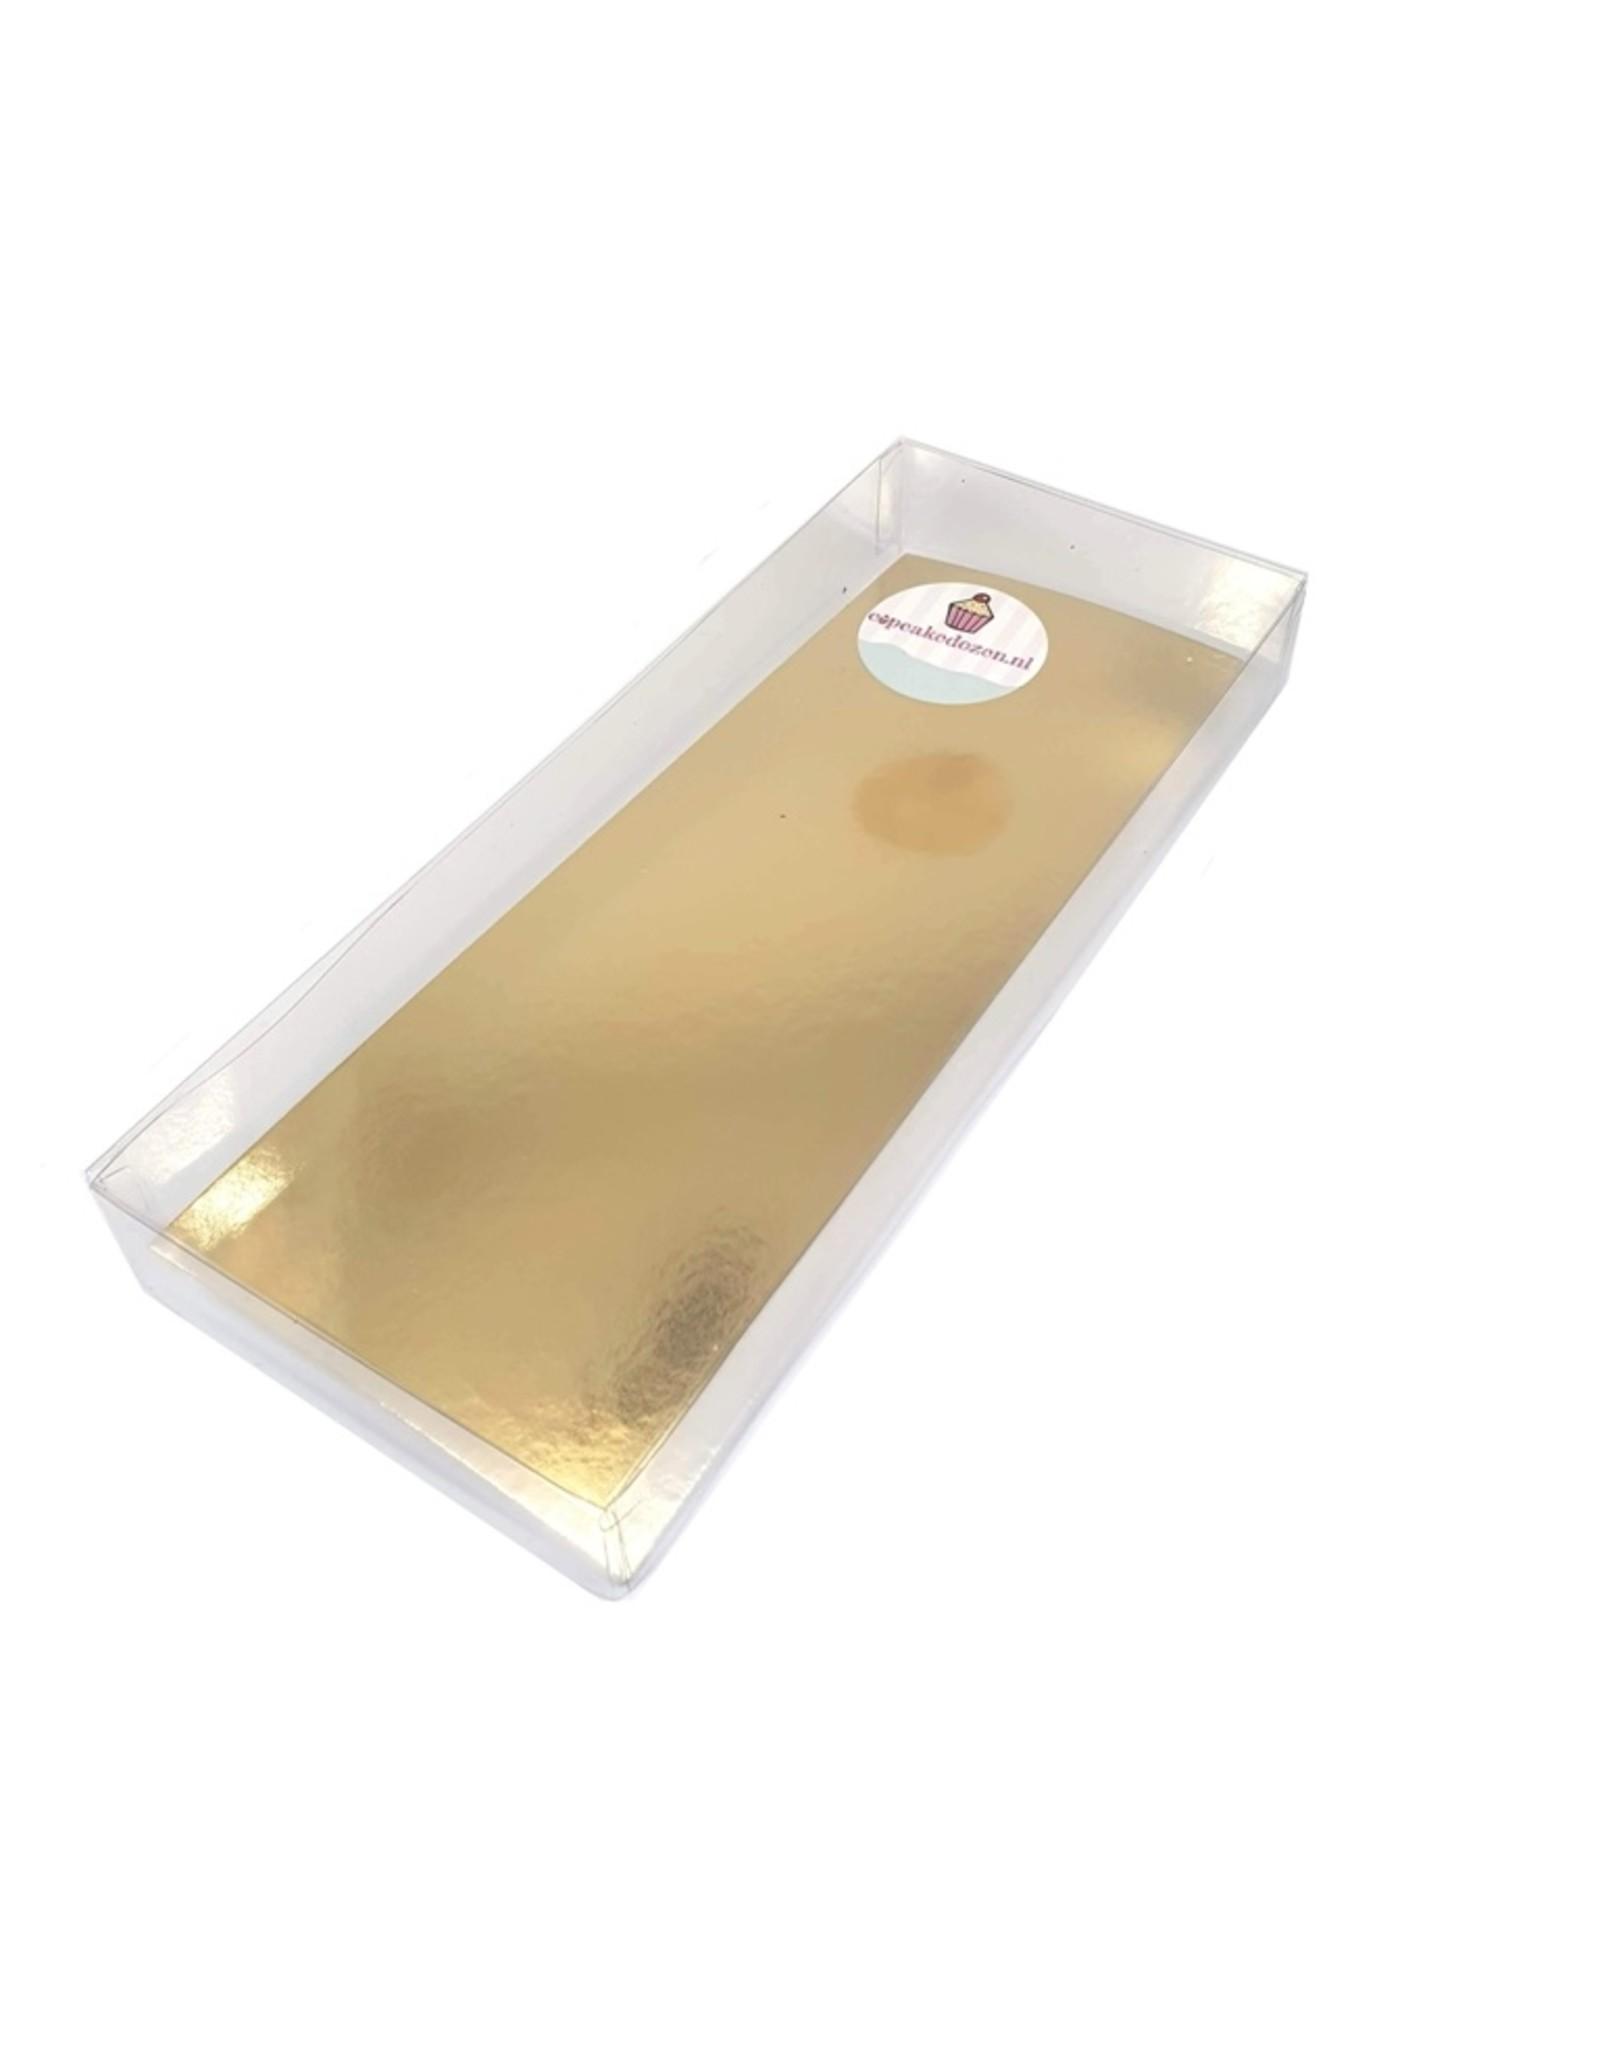 Transparant box rectangle - multiple sizes (per 100 pieces)